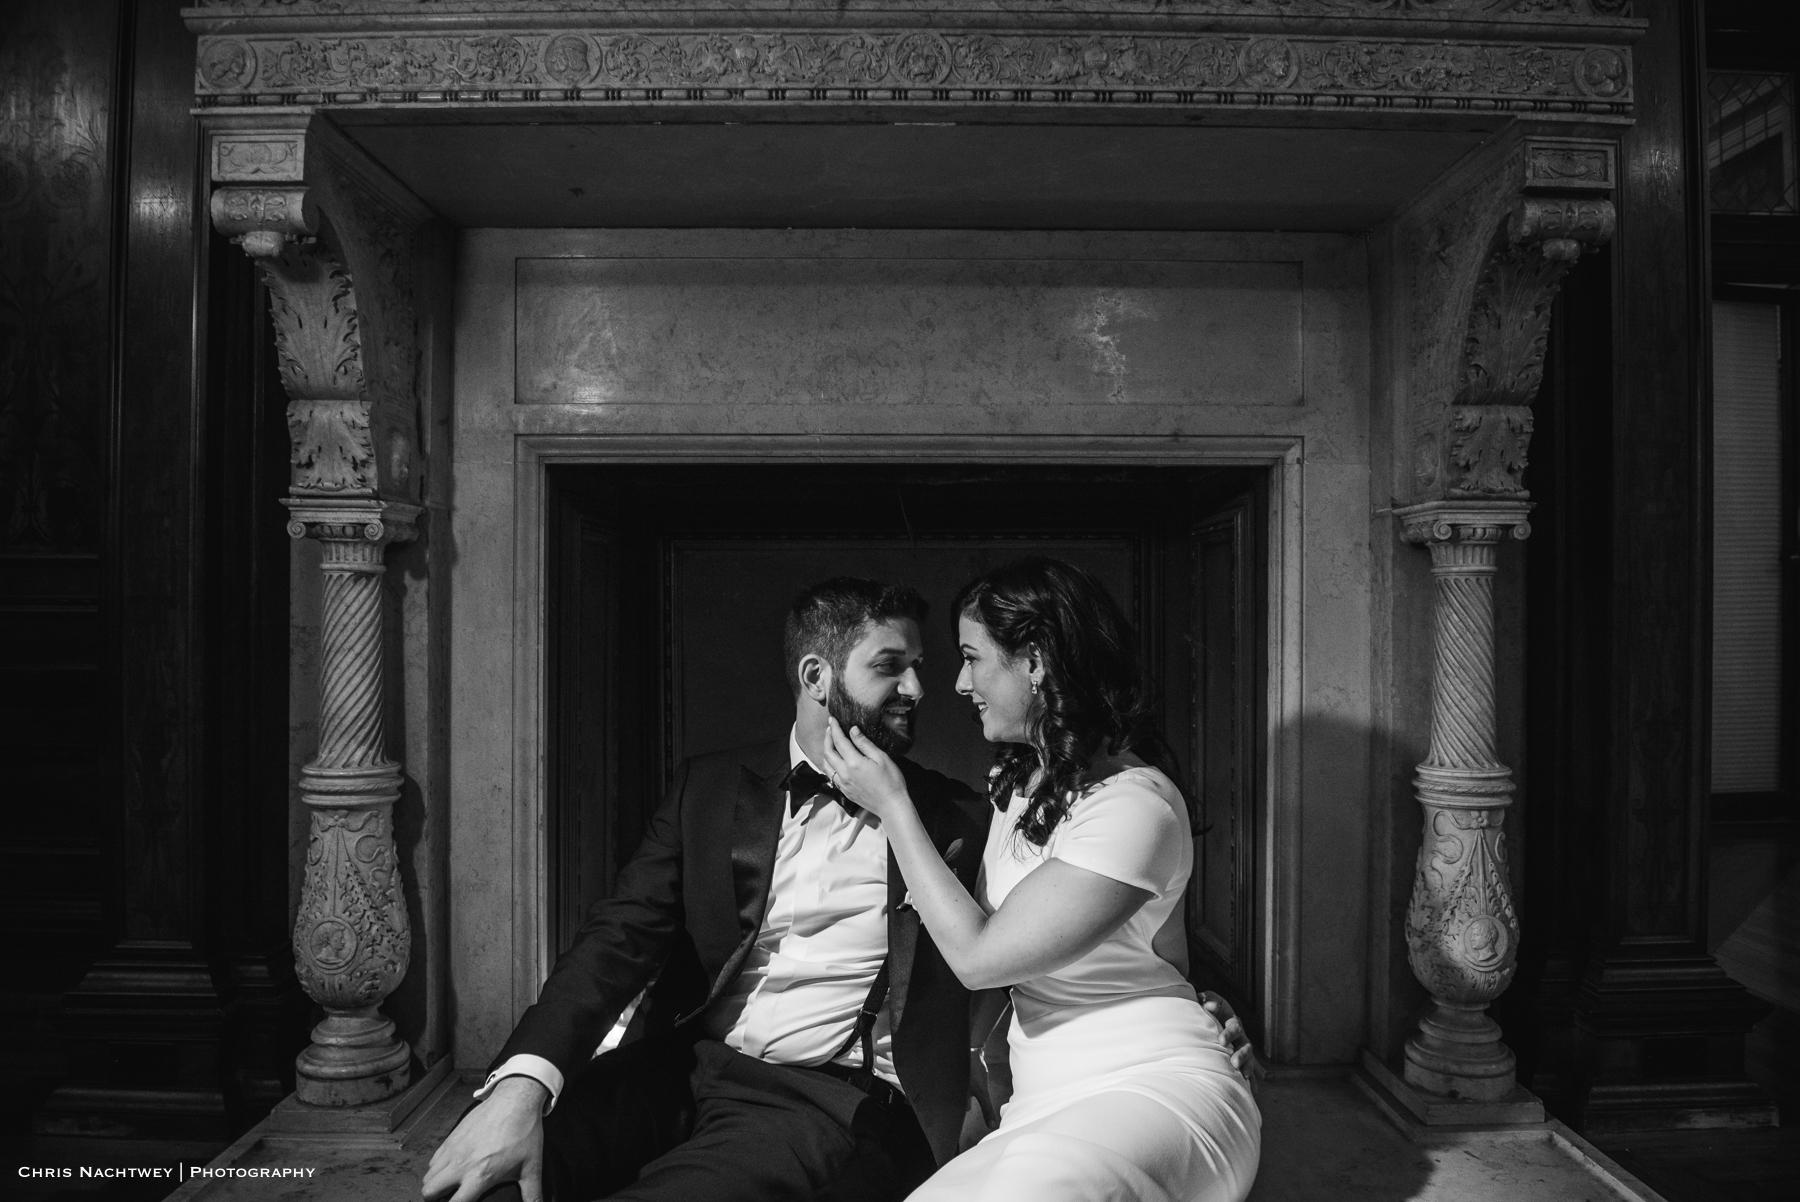 winter-branford-house-wedding-photos-groton-ct-chris-nachtwey-photography-2019-40.jpg